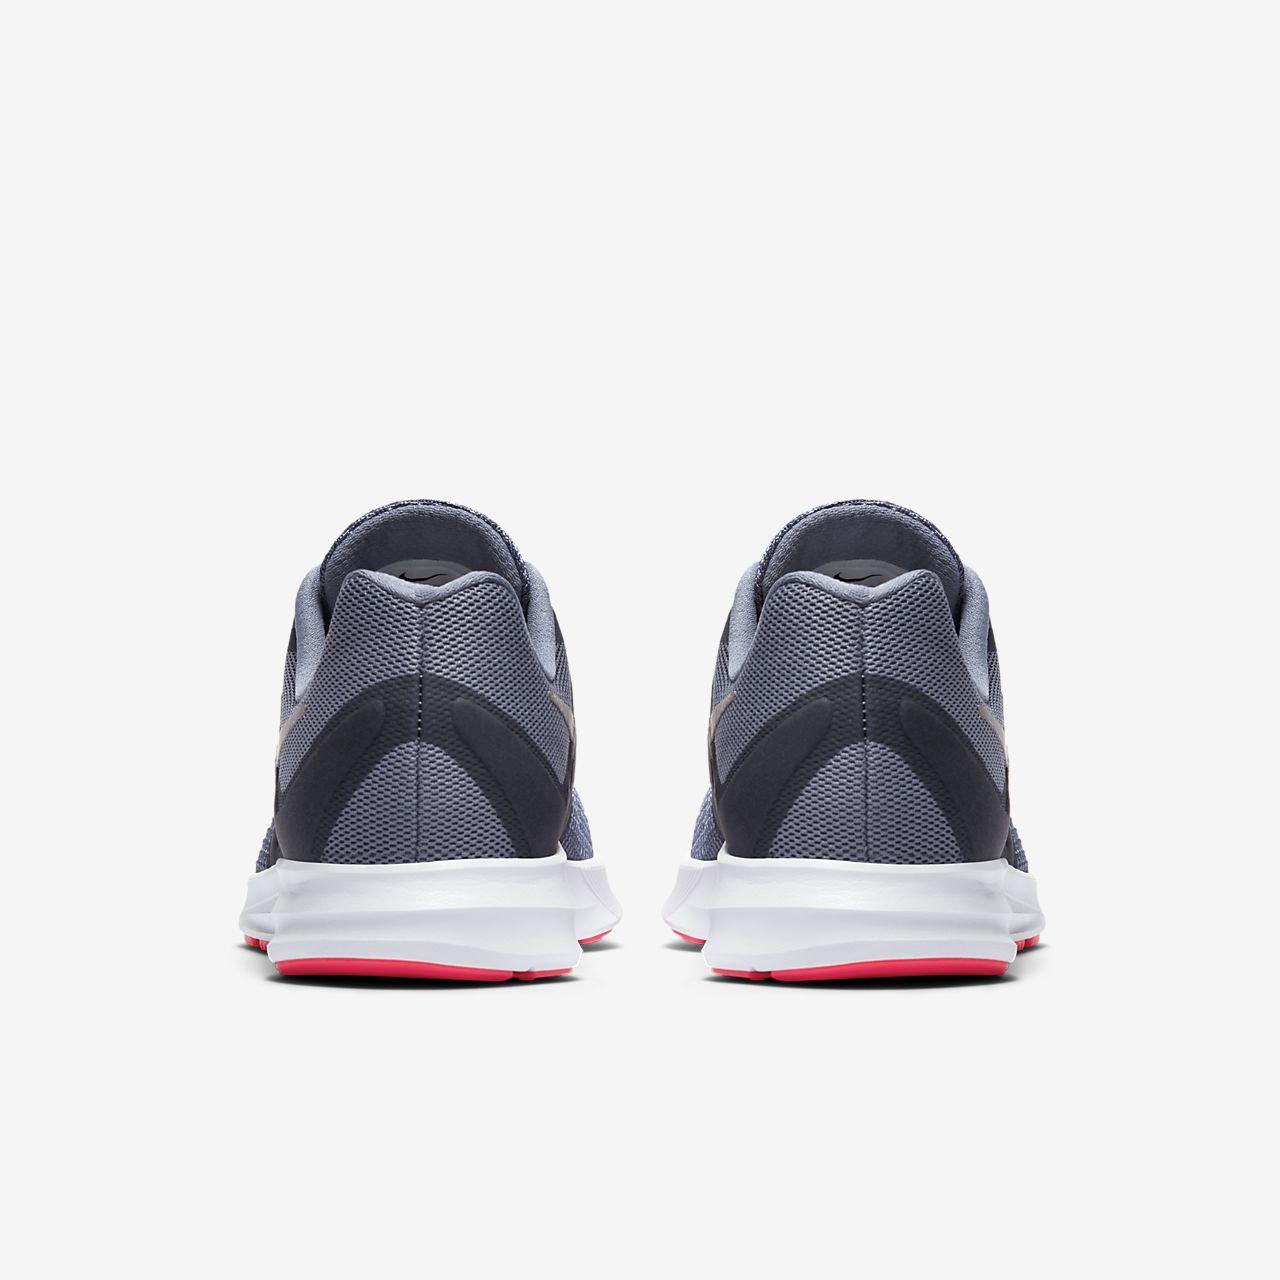 0e44e57cc2 Nike Downshifter 7 Older Kids' Running Shoe. Nike.com AU